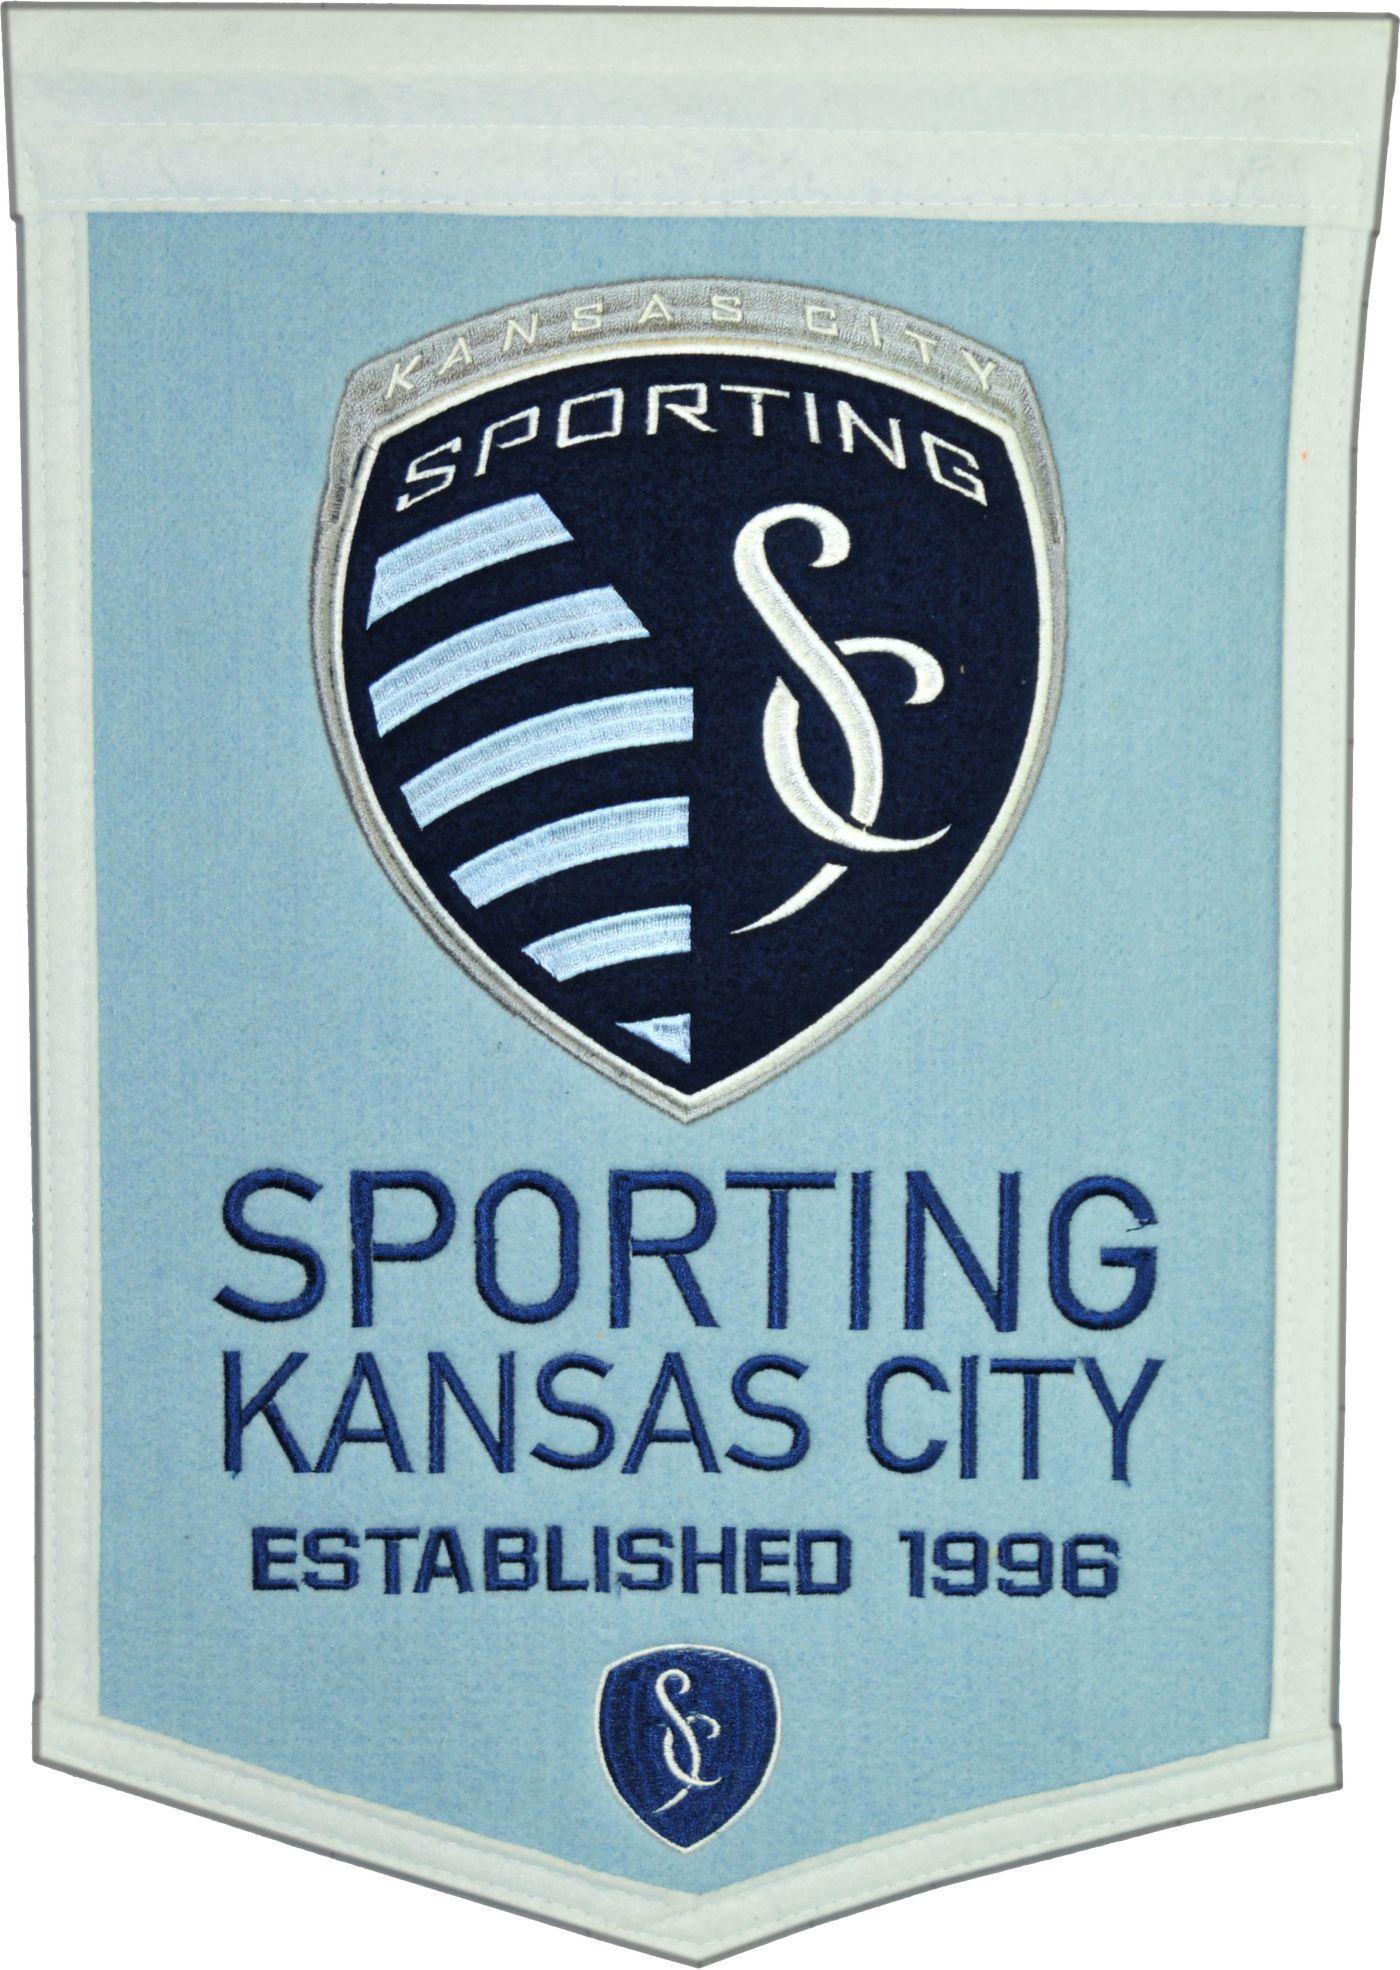 Winning Streak Sports Sporting Kansas City Team Tradition Banner